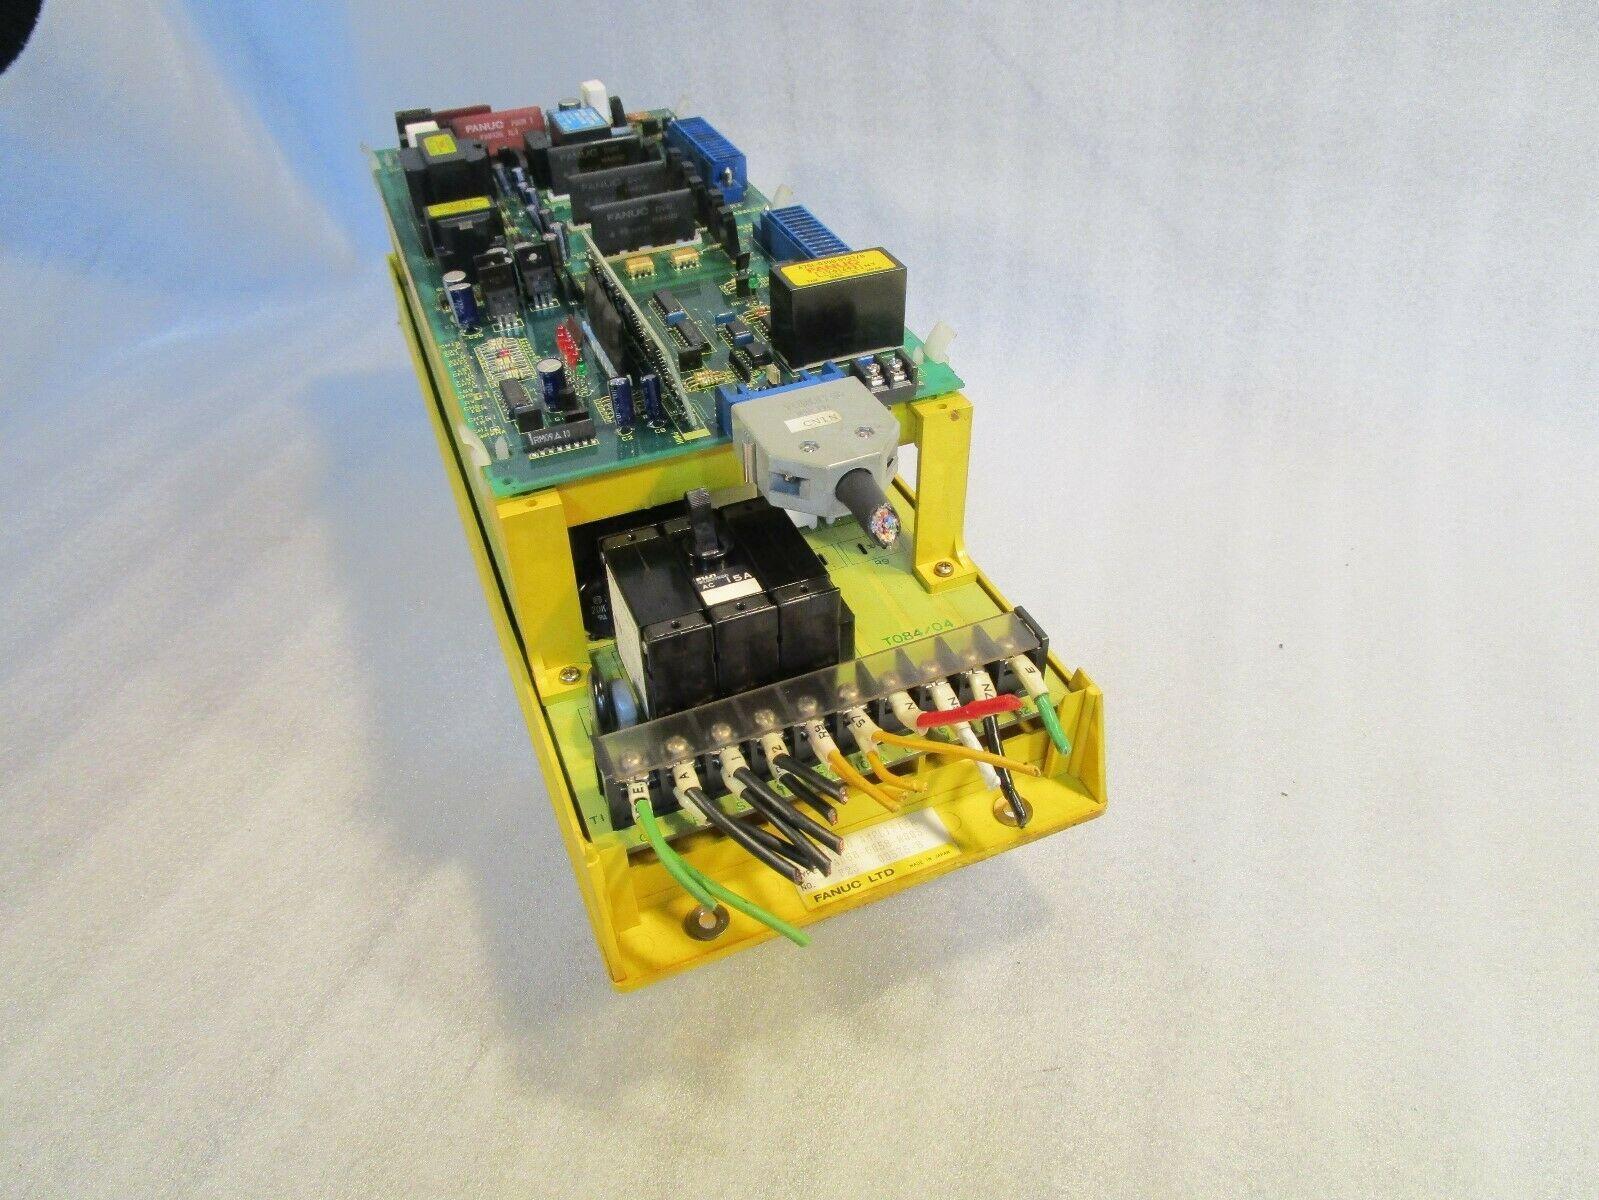 Fanuc A06B-6058-H005 Fanuc AC Axis Drive / Servo Amplifier